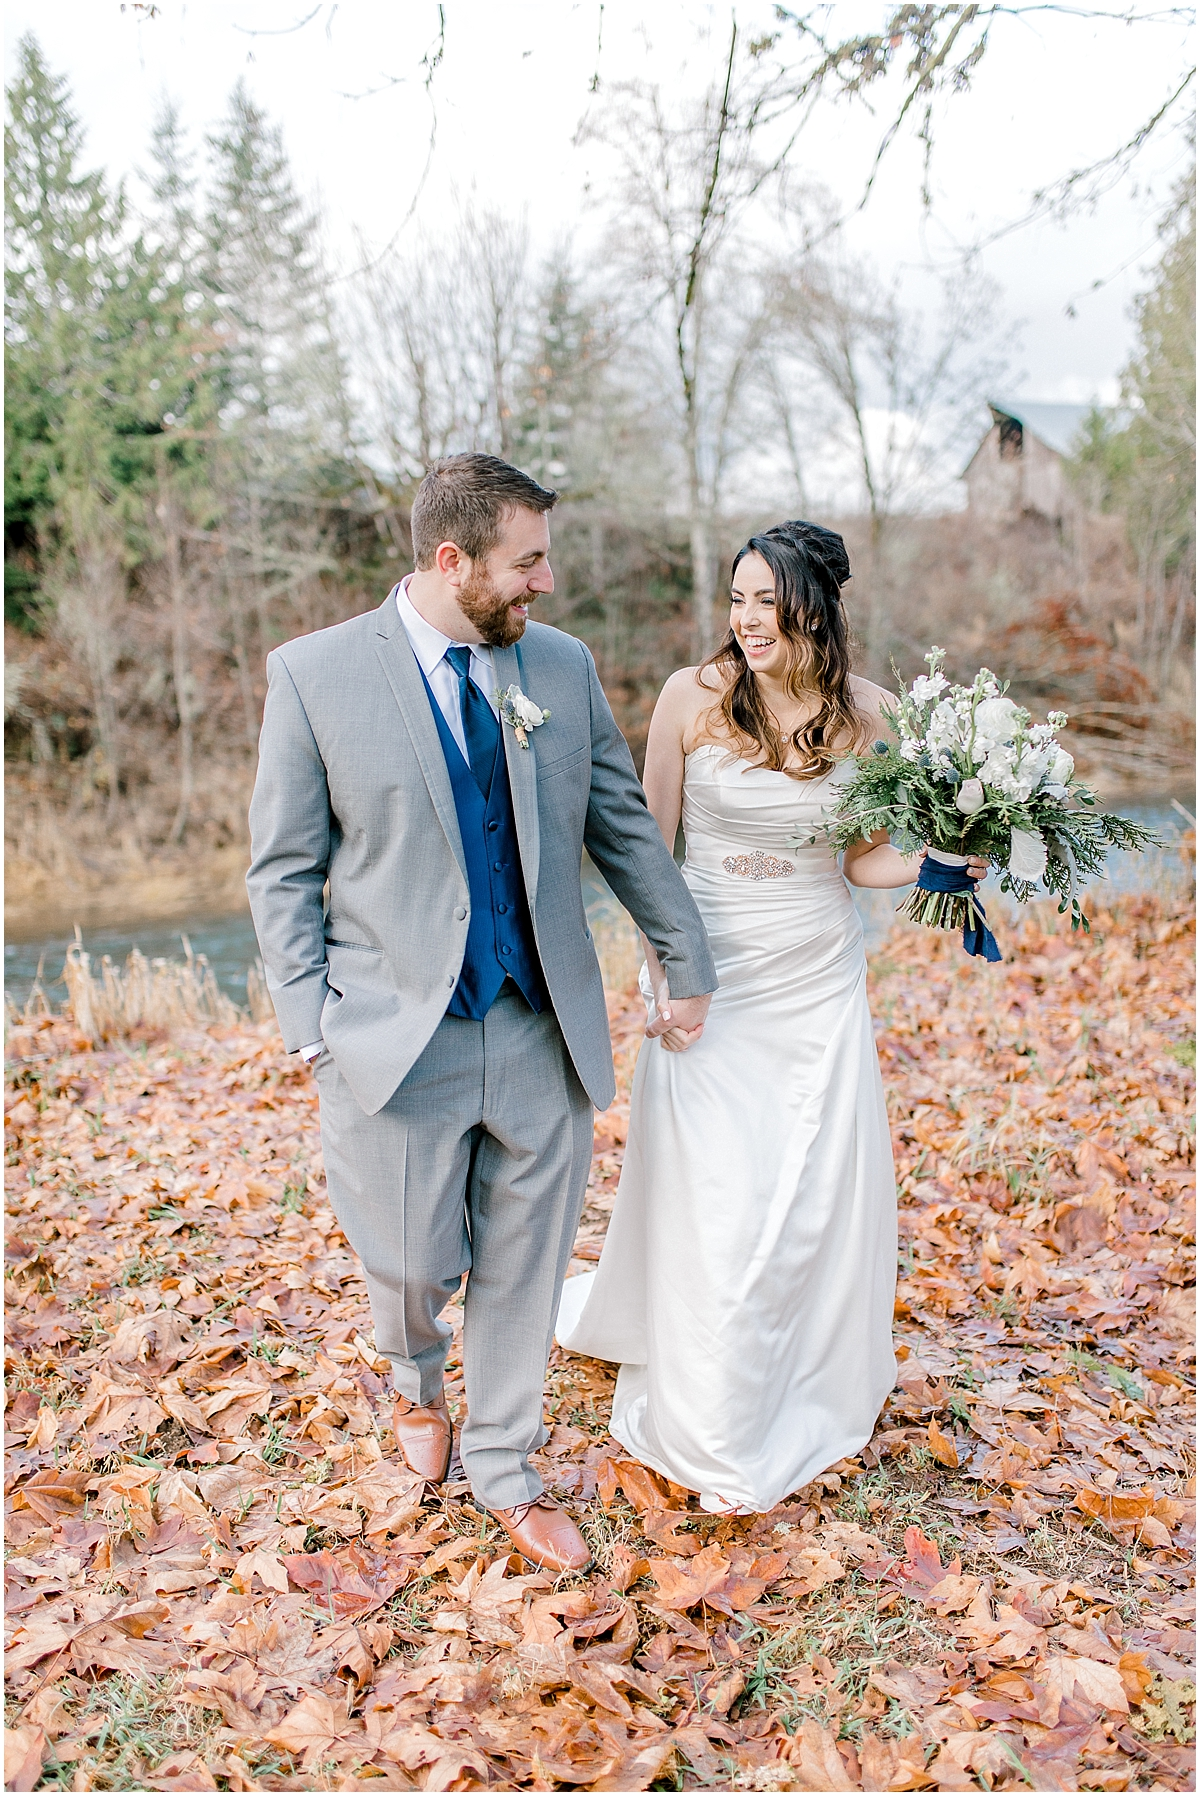 Chehalis Washington Winter Wedding Silver and White | Willapa Hills Farm Wedding | Eastham | Emma Rose Company PNW Light and Airy Wedding Photographer_0027.jpg